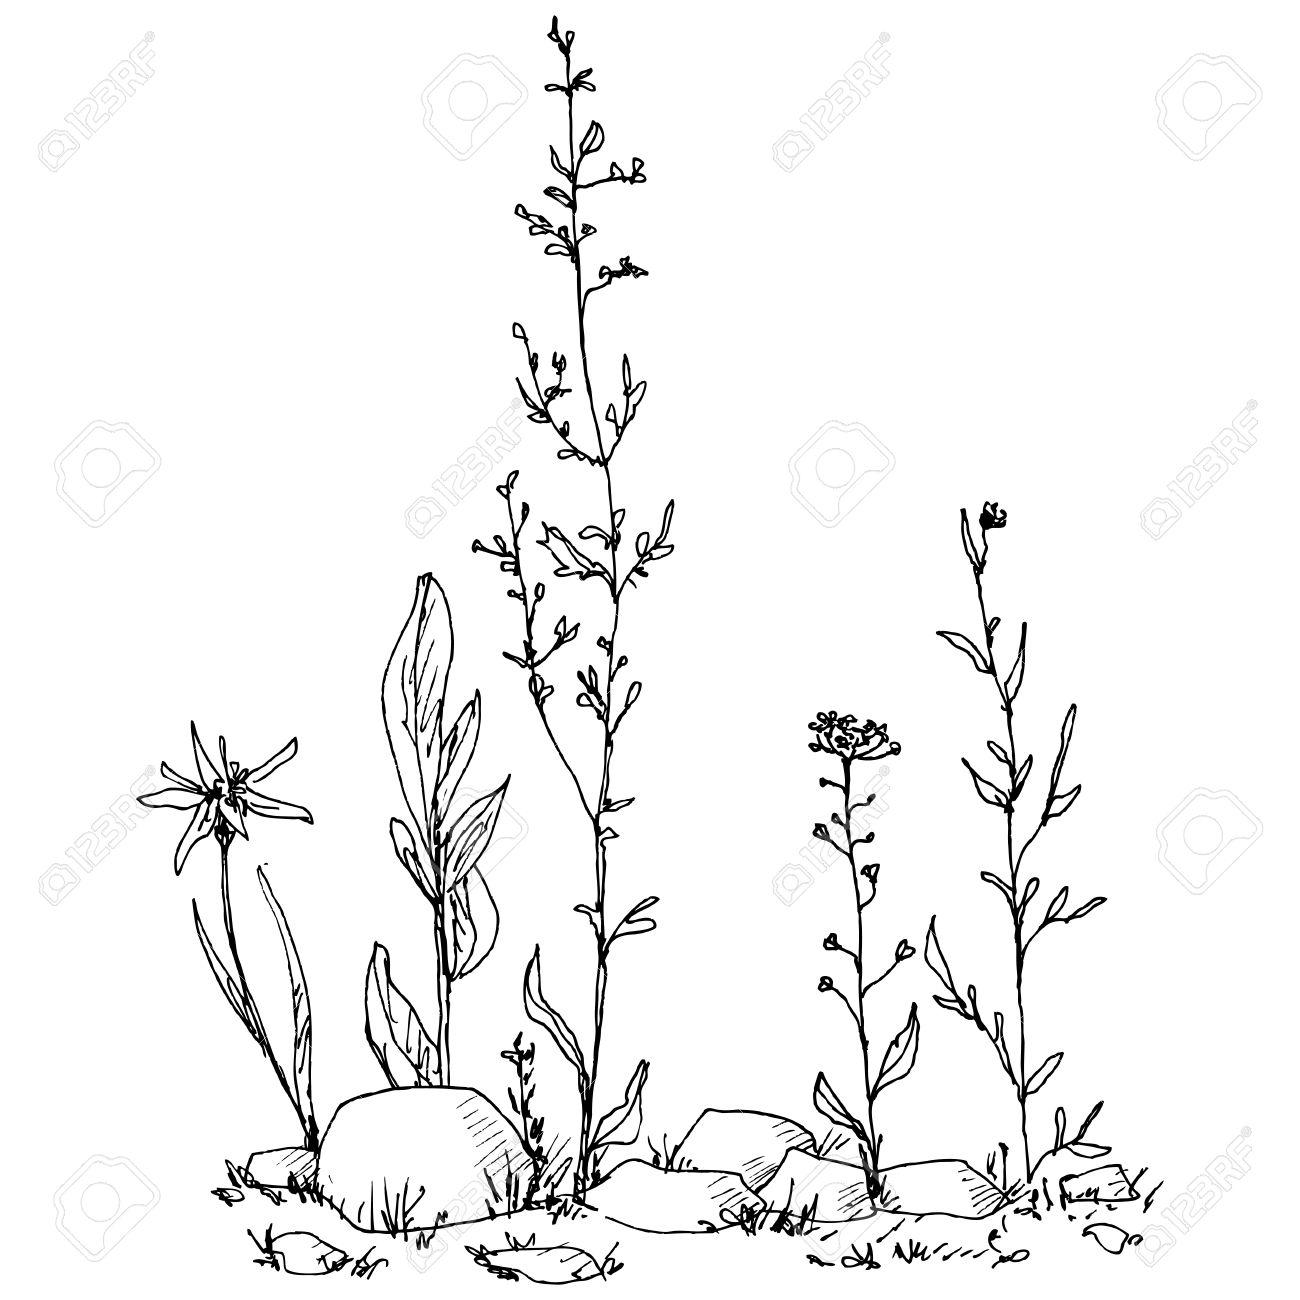 1300x1300 42237087 Composici N Floral Con Hierbas Para Dibujar Con Tinta